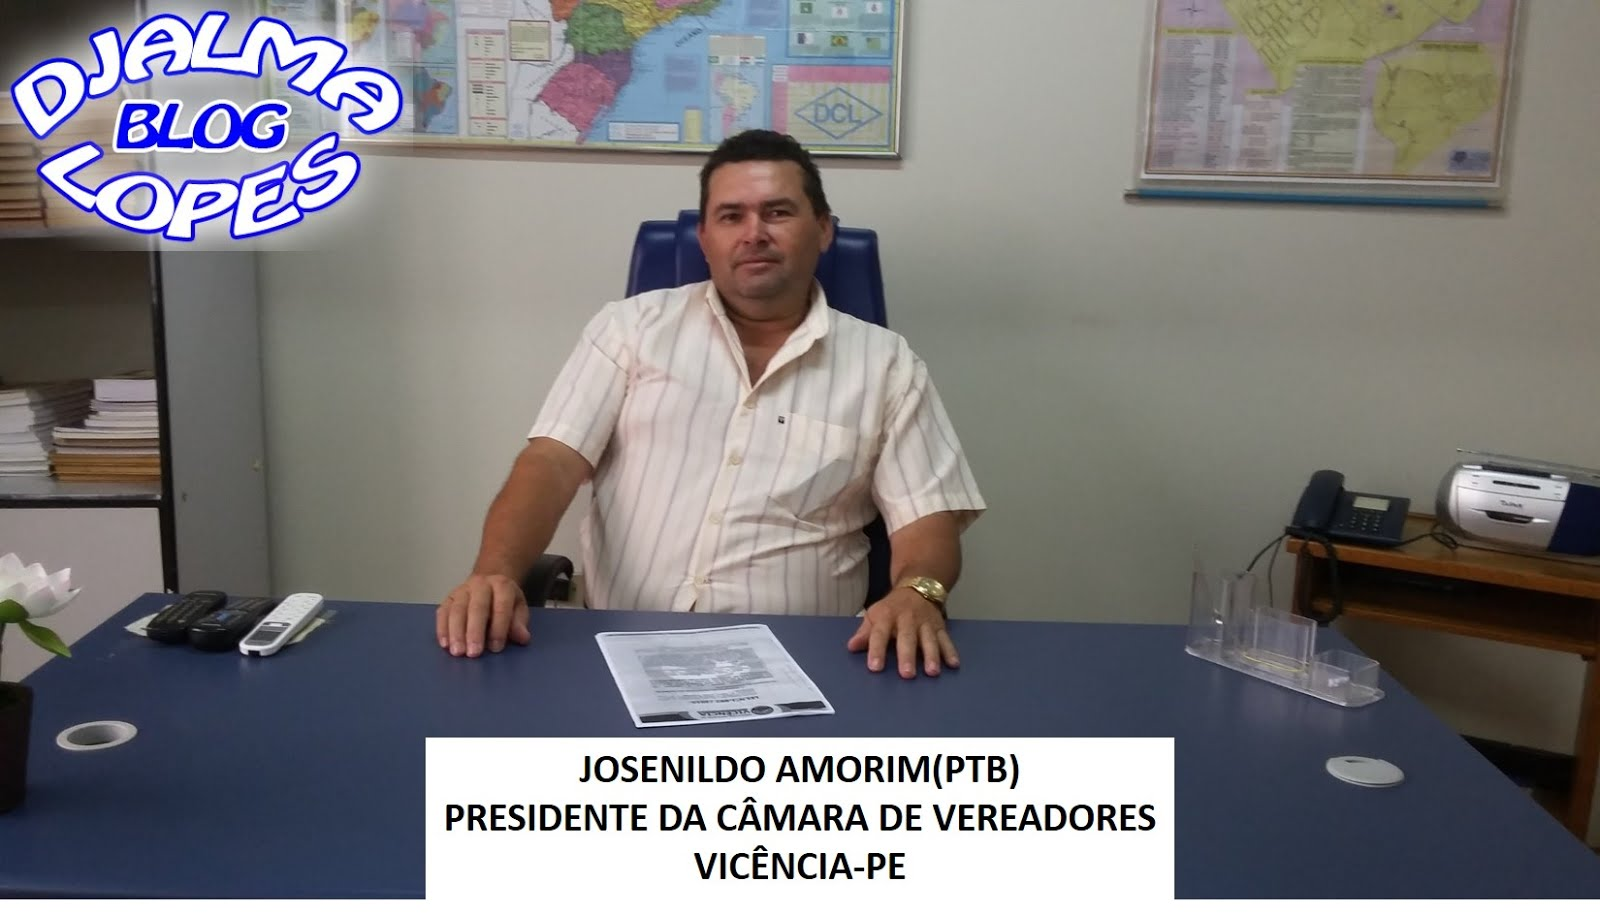 JOSENILDO AMORIM(PTB) - VICÊNCIA-PE